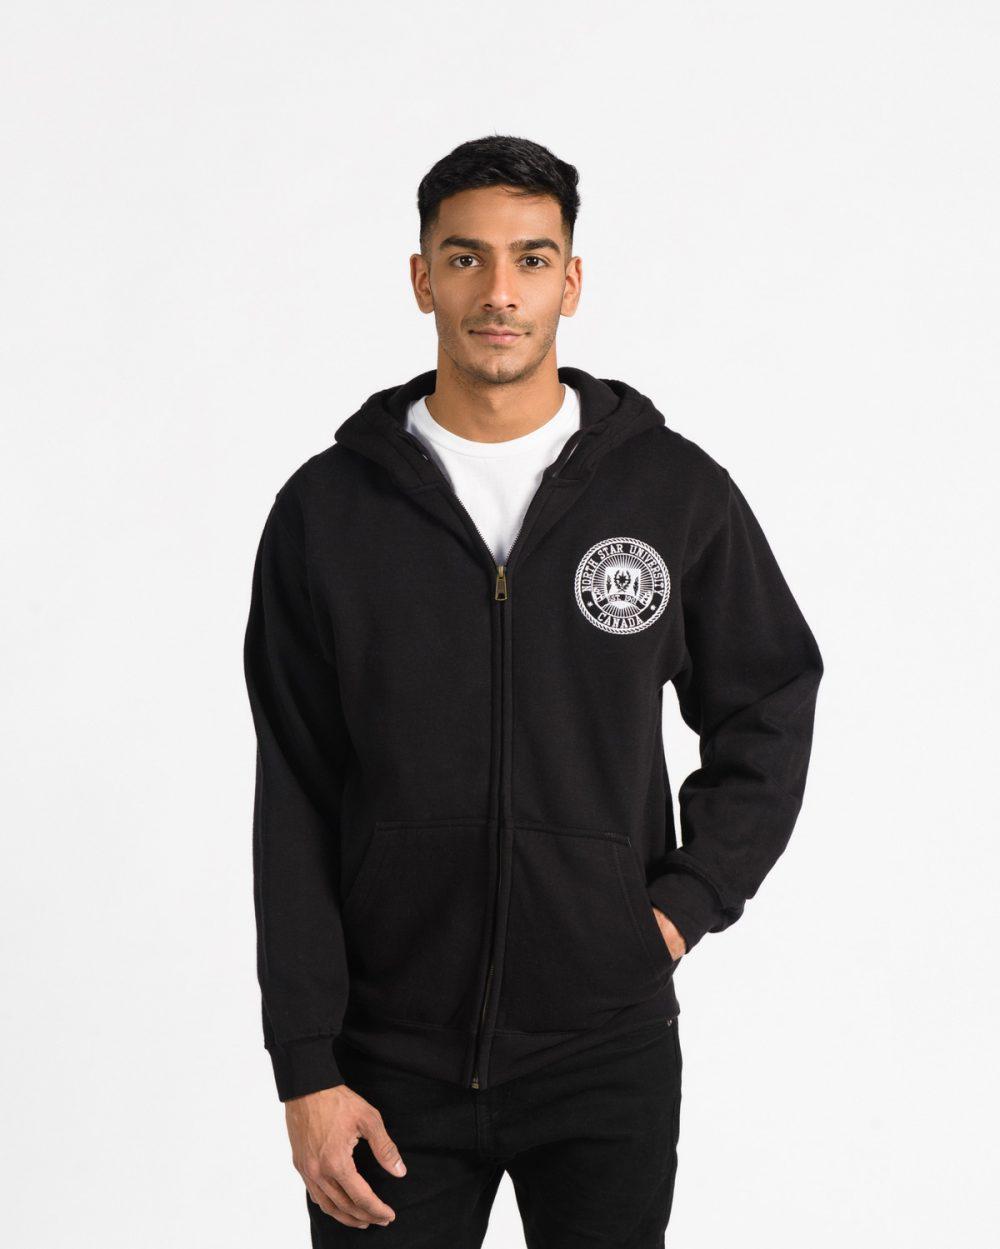 Premium Full Zip 103 in black on male model.